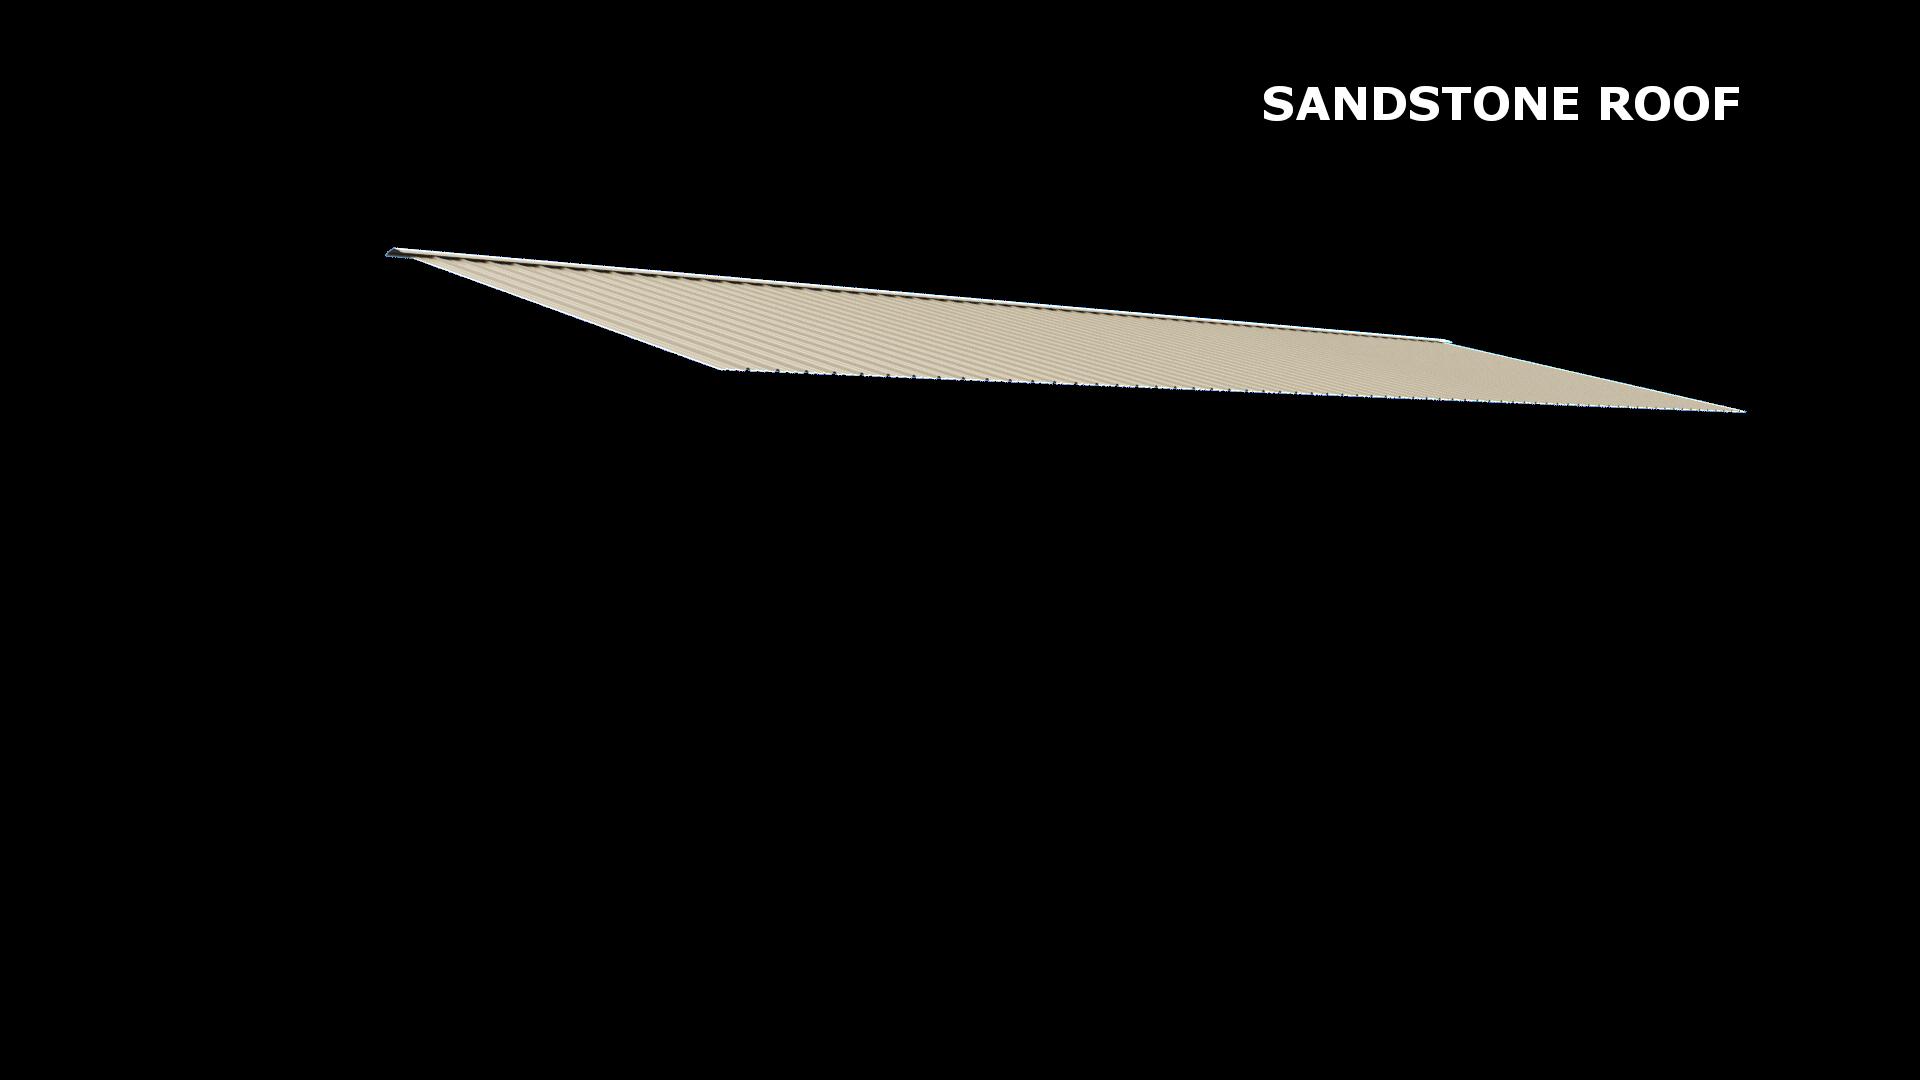 SANDSTONE ROOF